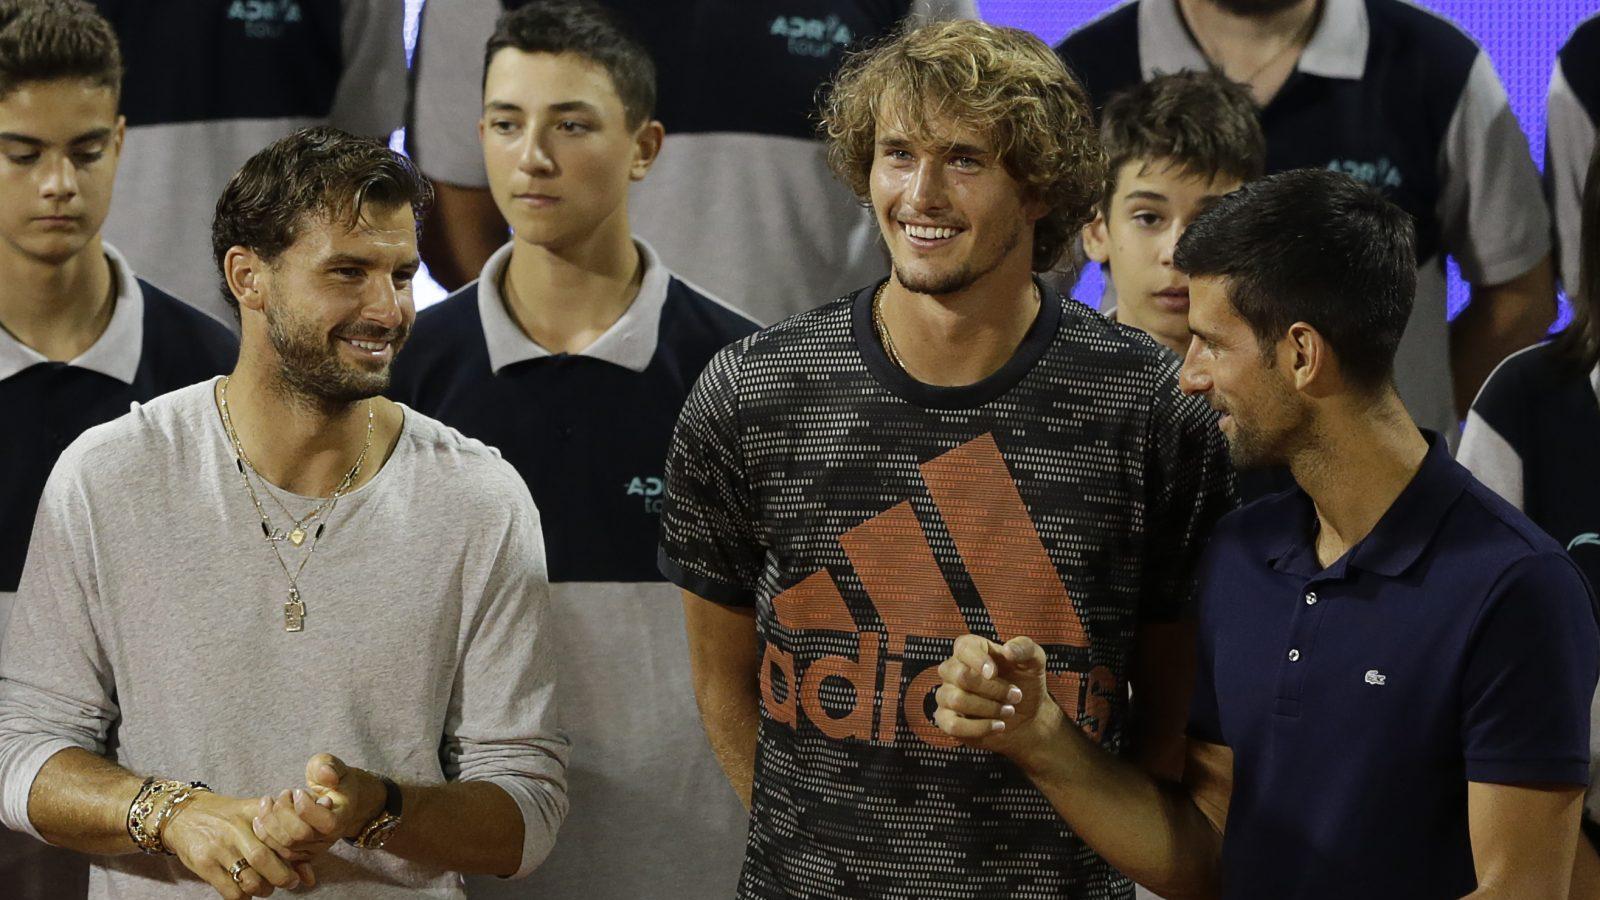 Tennis Star Dimitrov's COVID-19 Diagnosis Alarms Bulgarian ...